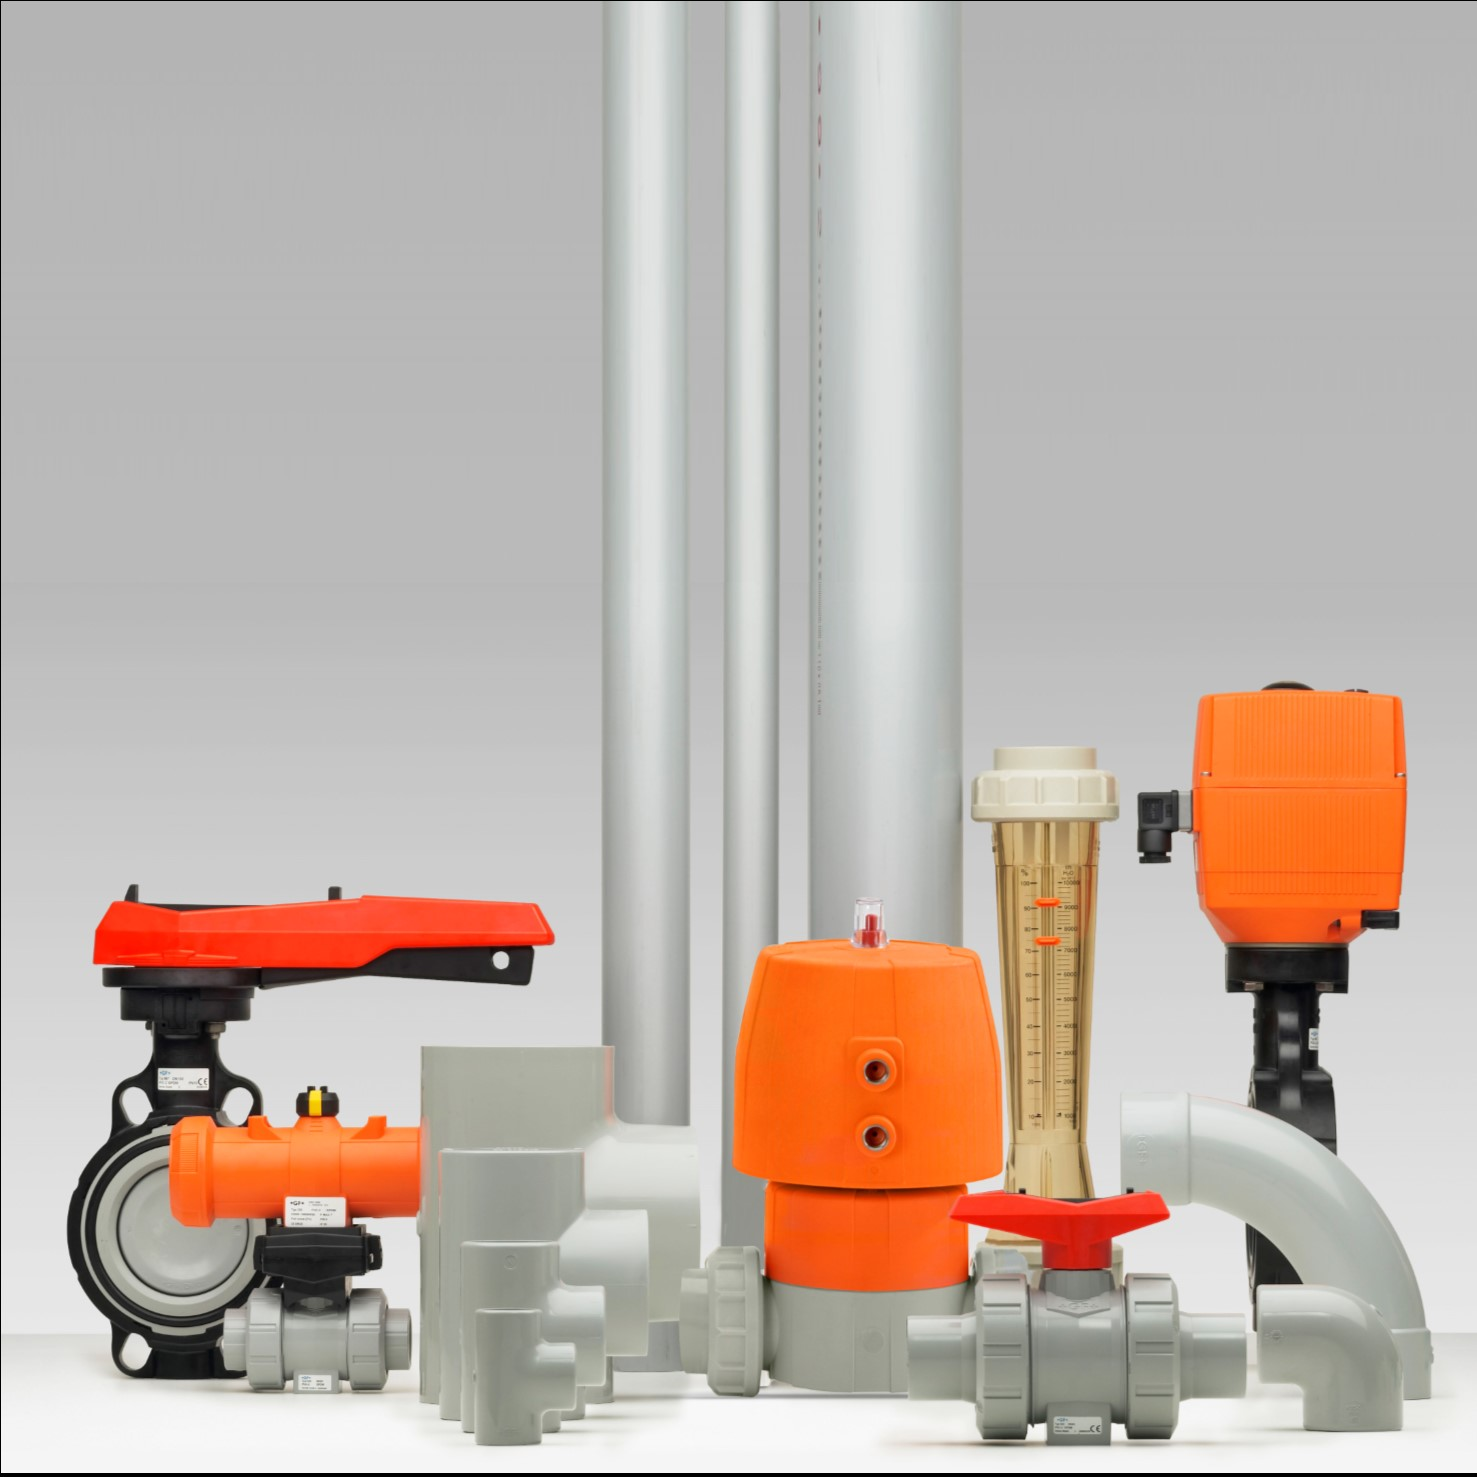 PVC-C industriële kunststof leidingsystemen